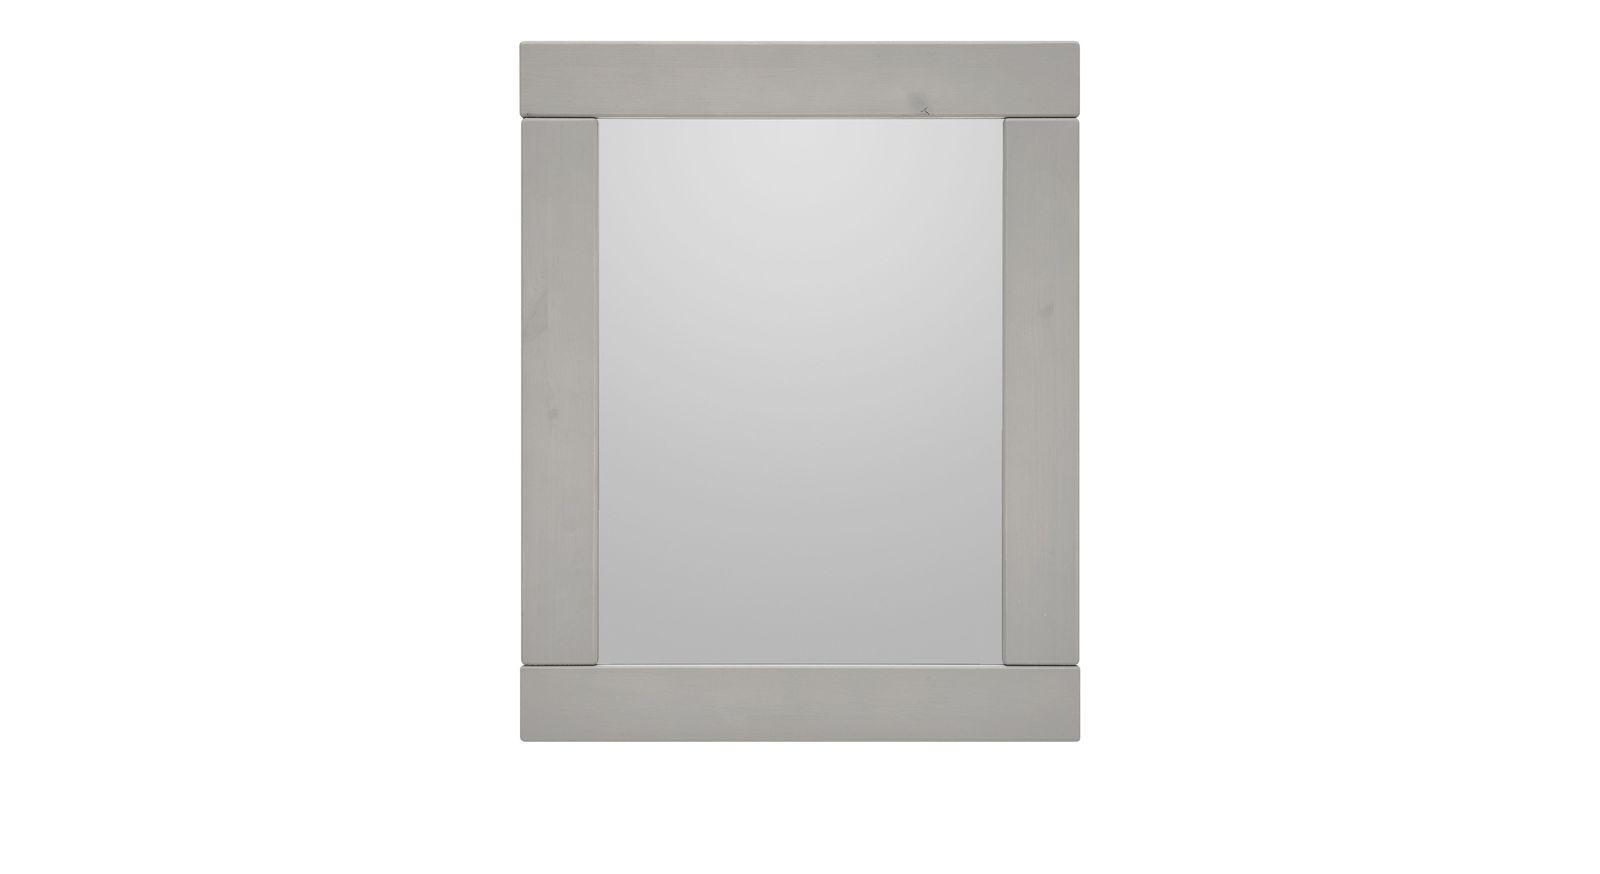 LIFETIME Wandspiegel Original grau lasiert